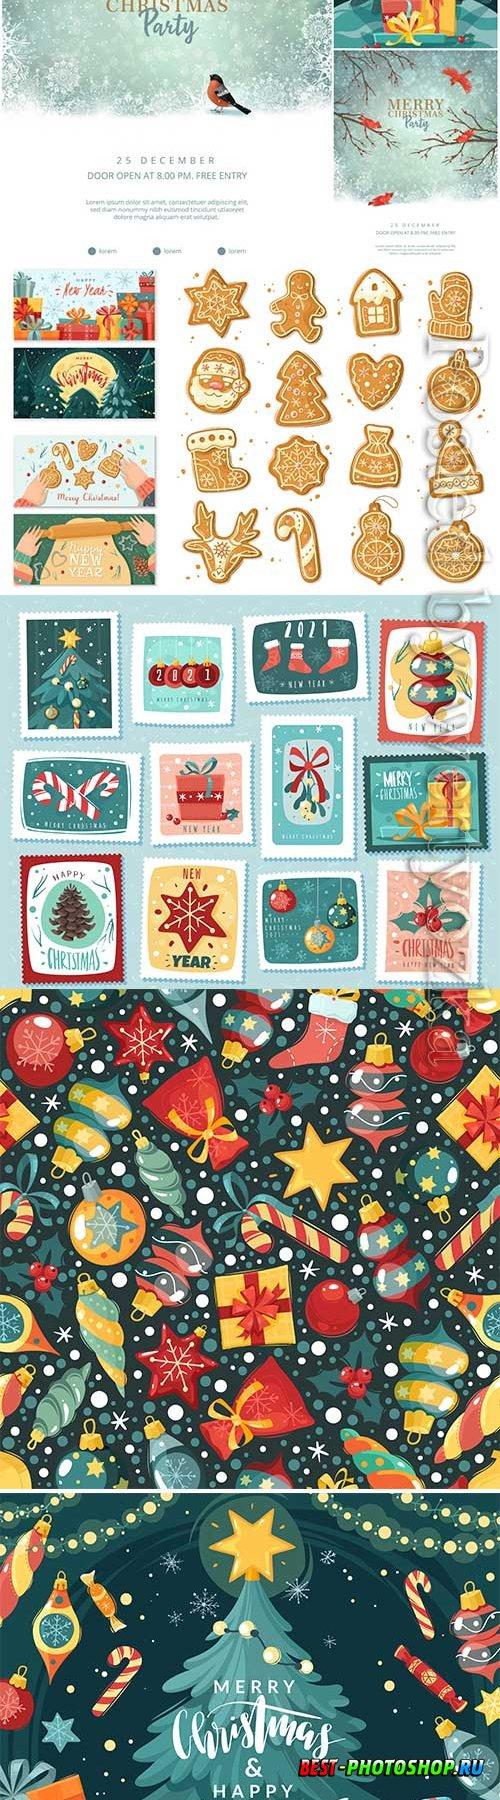 Christmas vector illustration, christmas tree with gifts